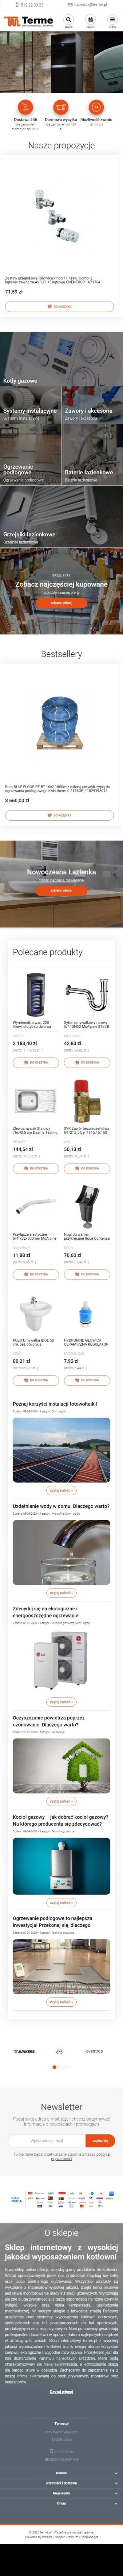 Sklep internetowy terme.pl - zrzut mobile